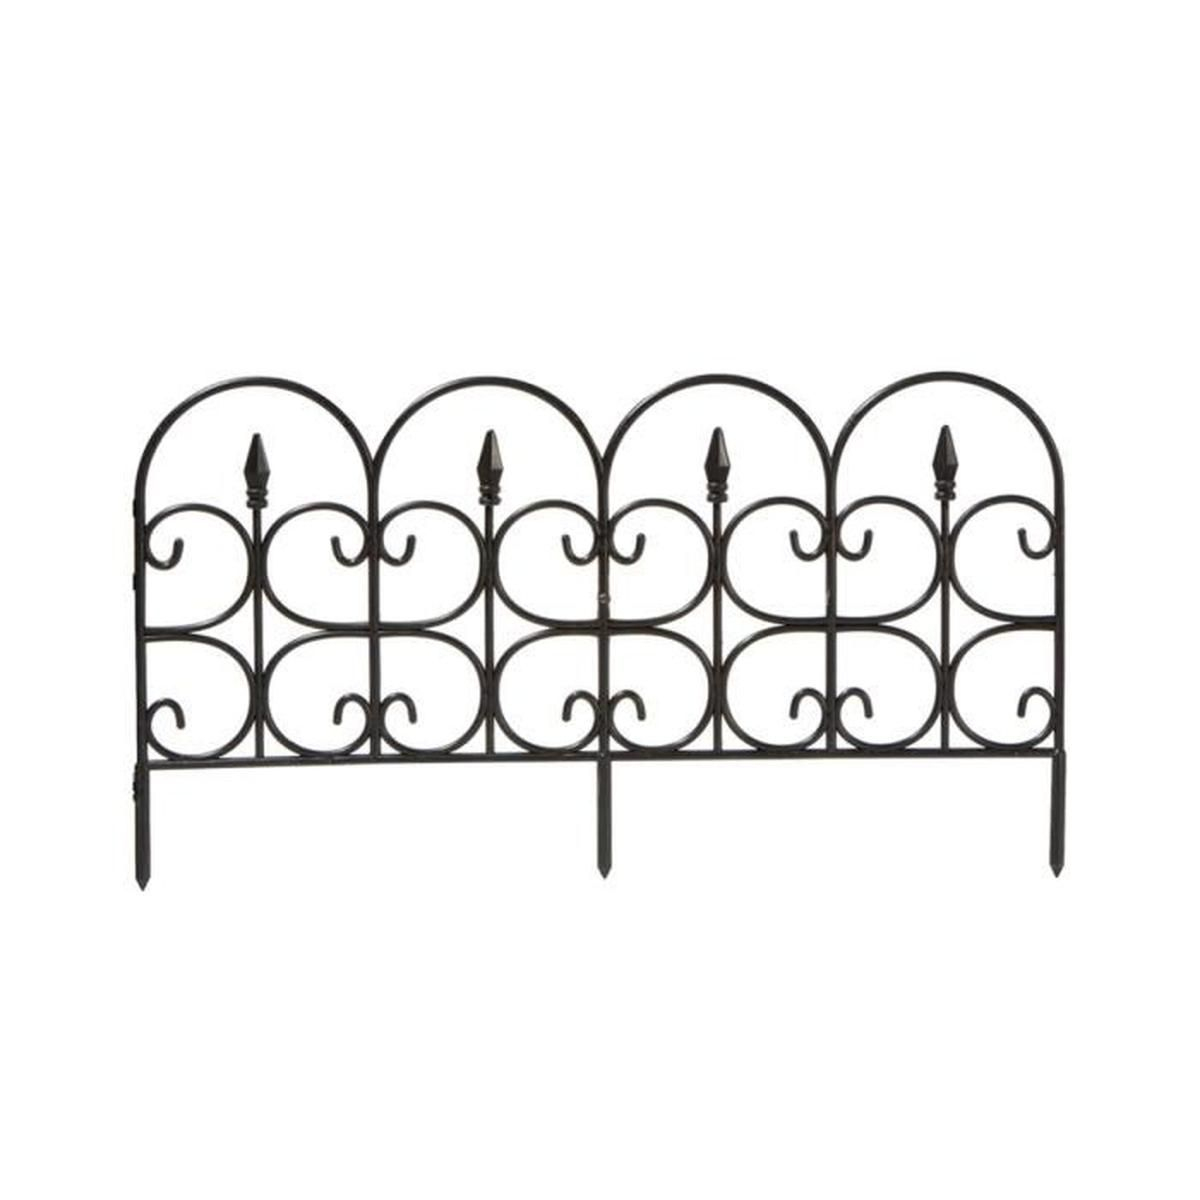 Bordure De Jardin Oxford Imitation Métal - 20 X 60 Cm (Lot ... serapportantà Bordure Jardin Metal